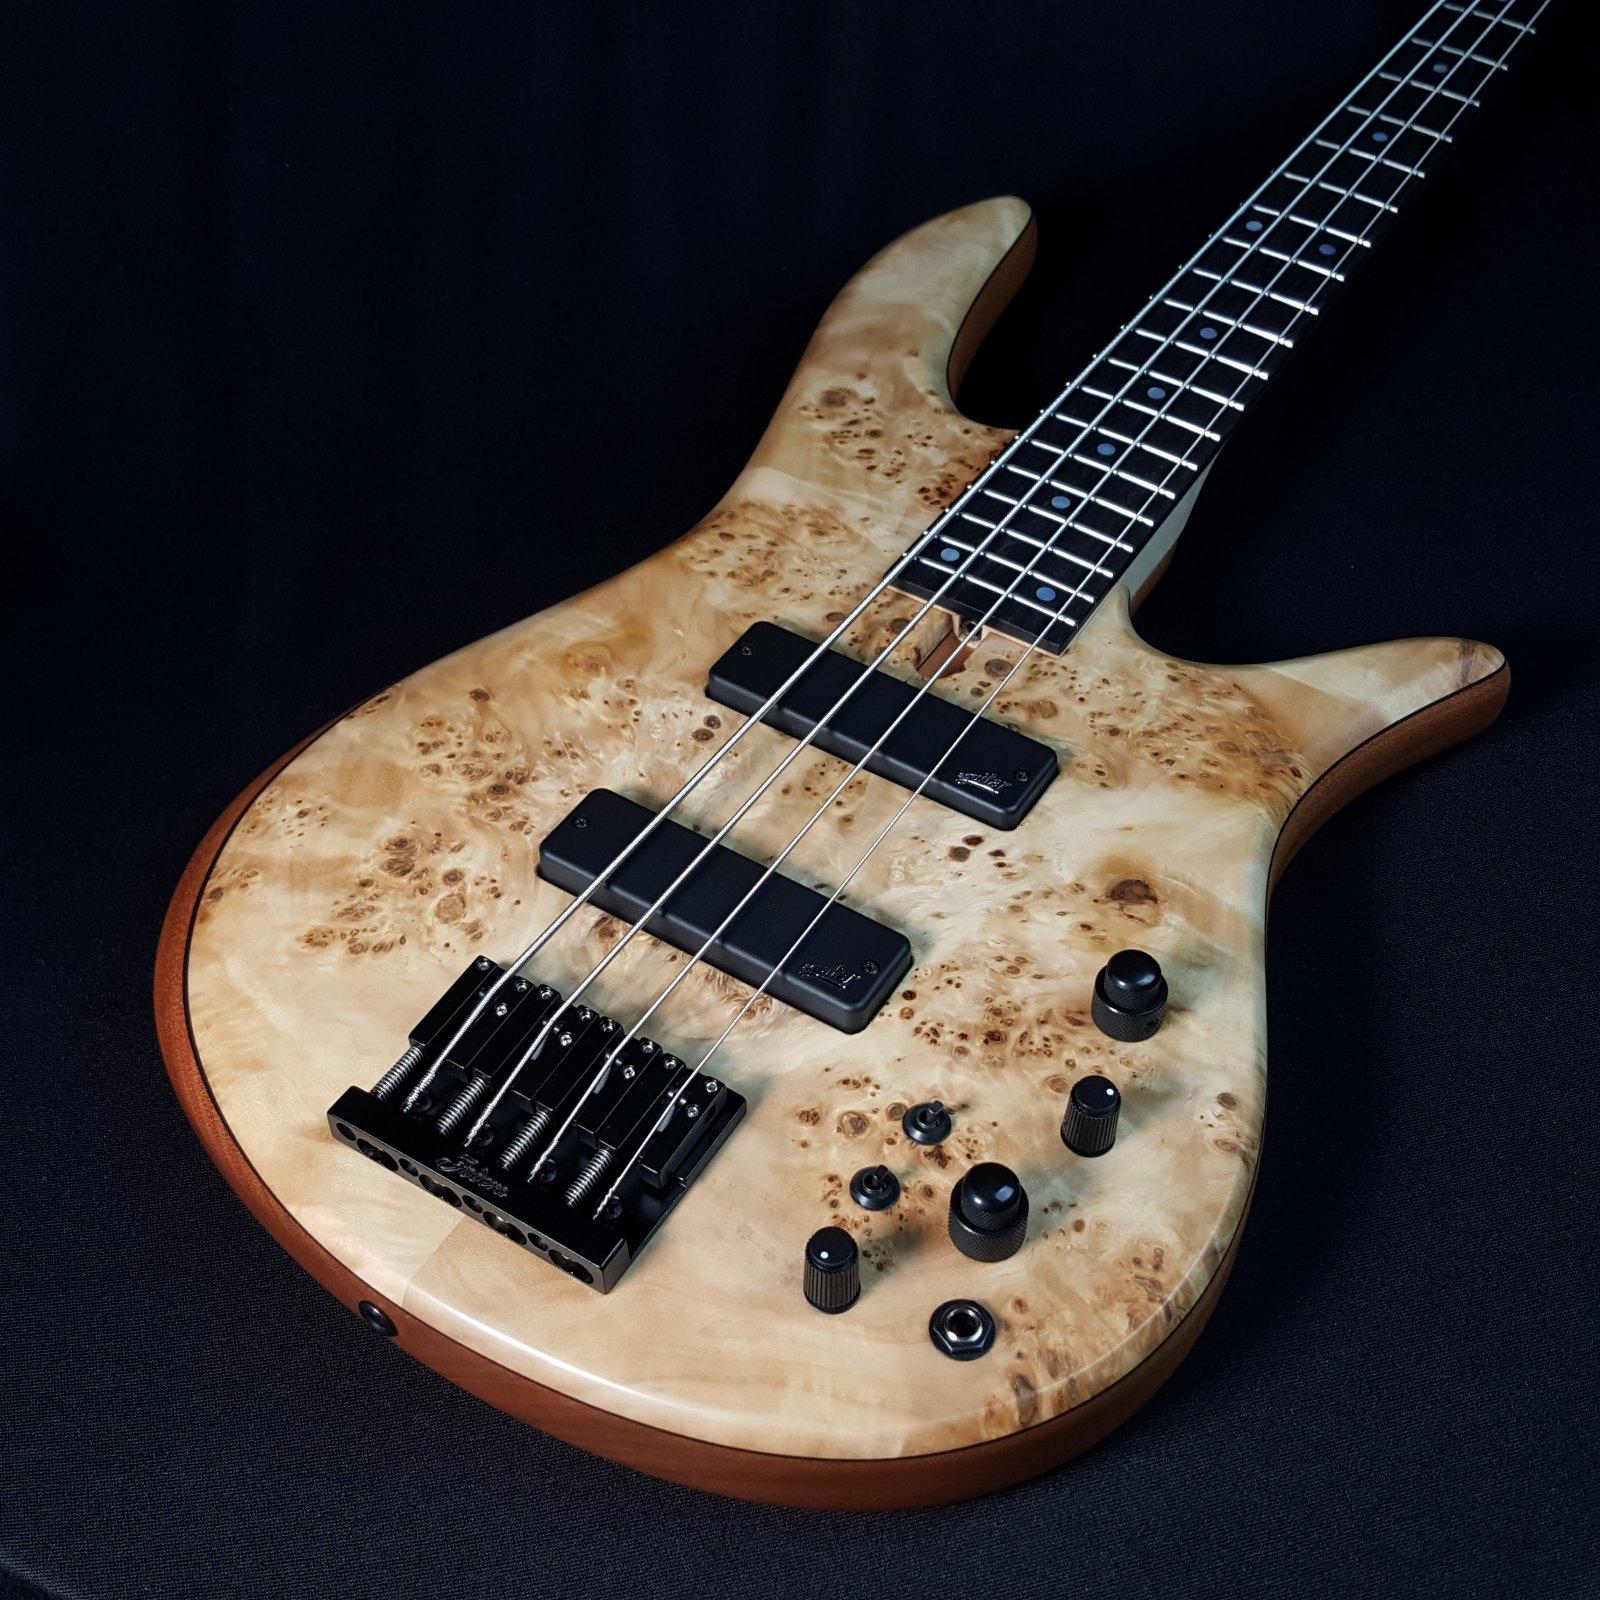 Fodera Monarch 4 Standard Special Poplar Burl 4 String Bass With Case